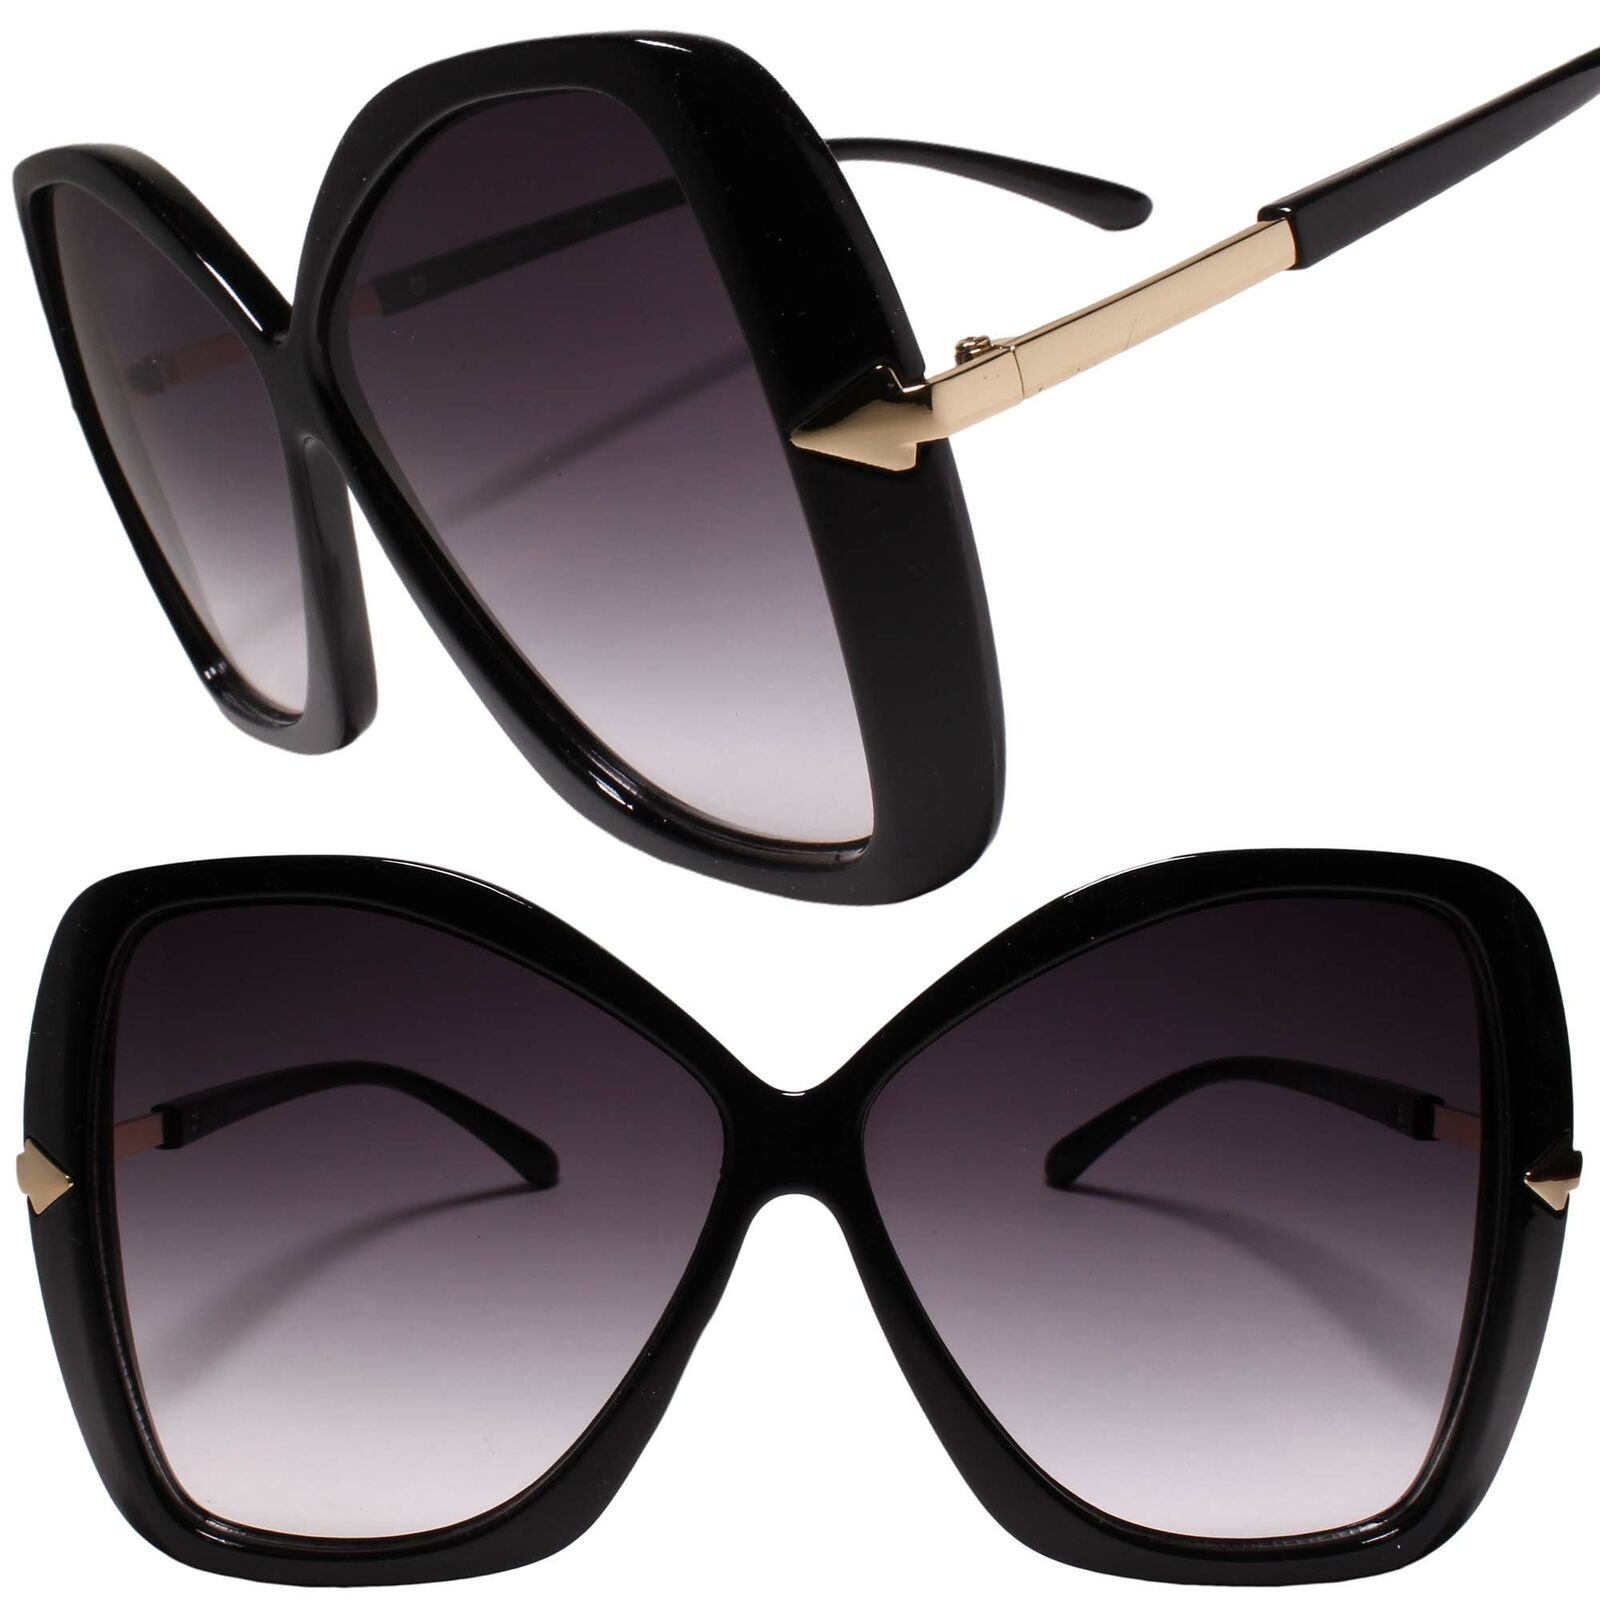 Classy Luxury Oversized Exaggerated Womens Black & Gold Sunglasses